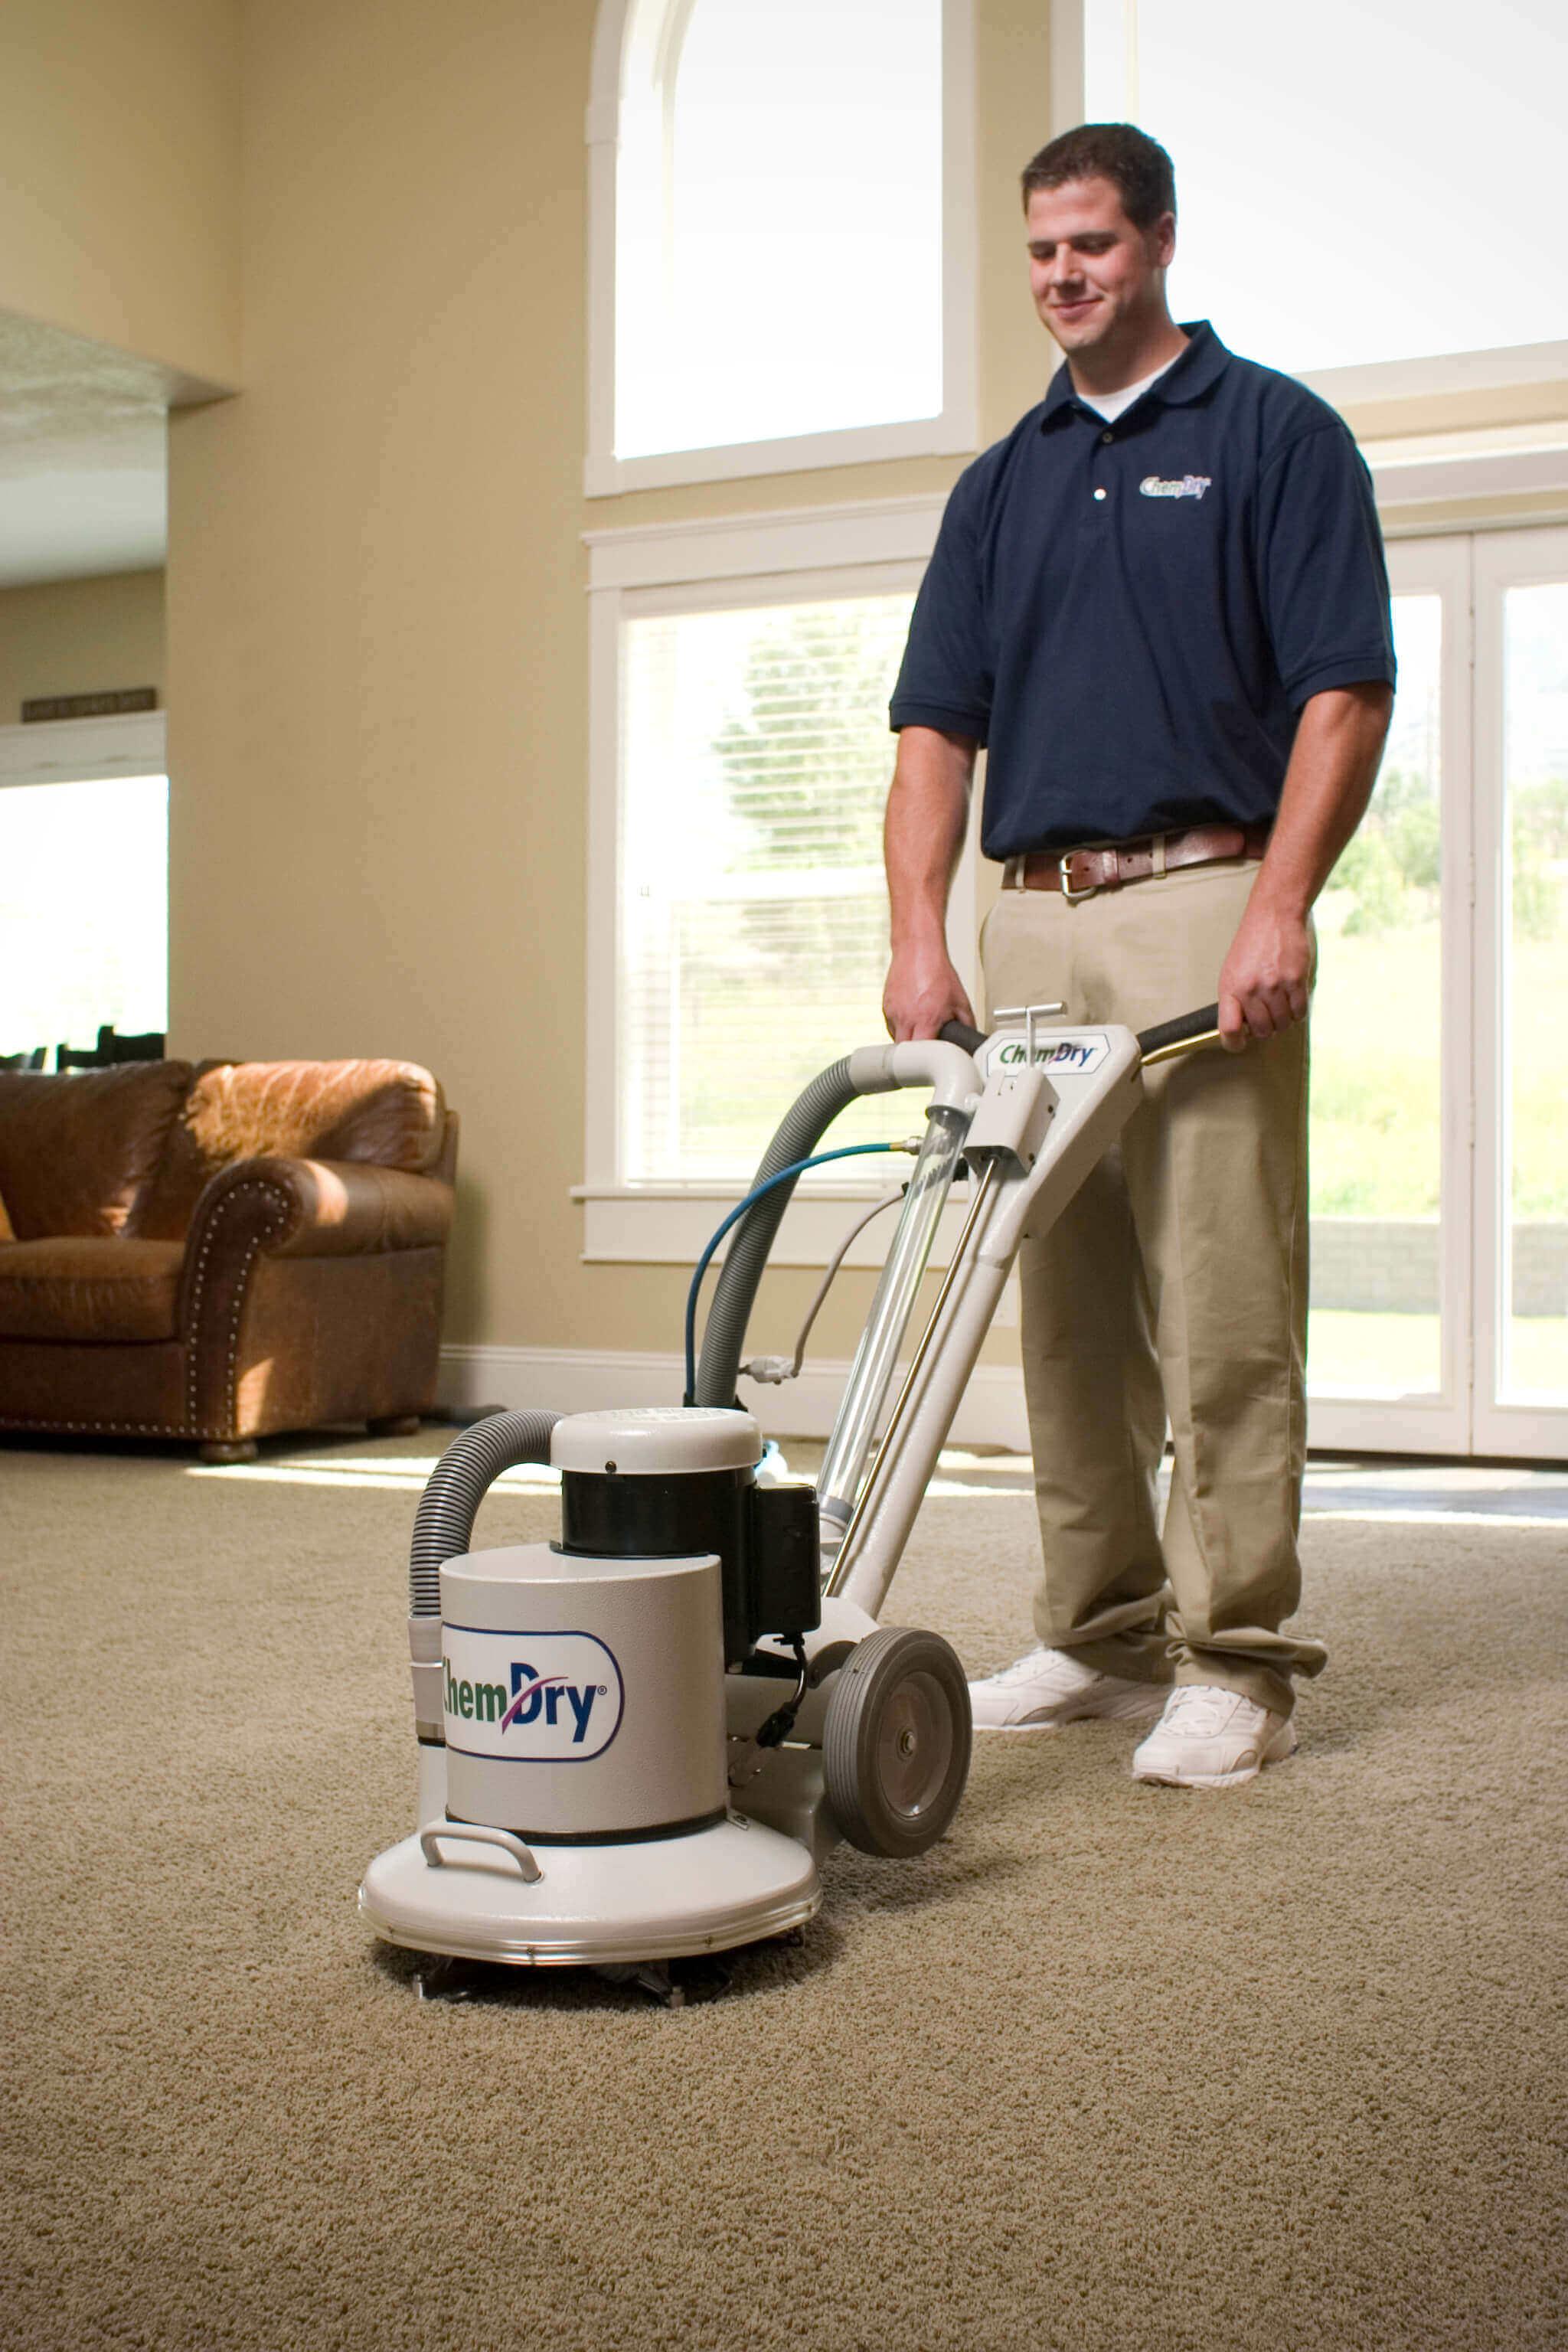 carpet cleaner cleaning a carpet in norfolk va